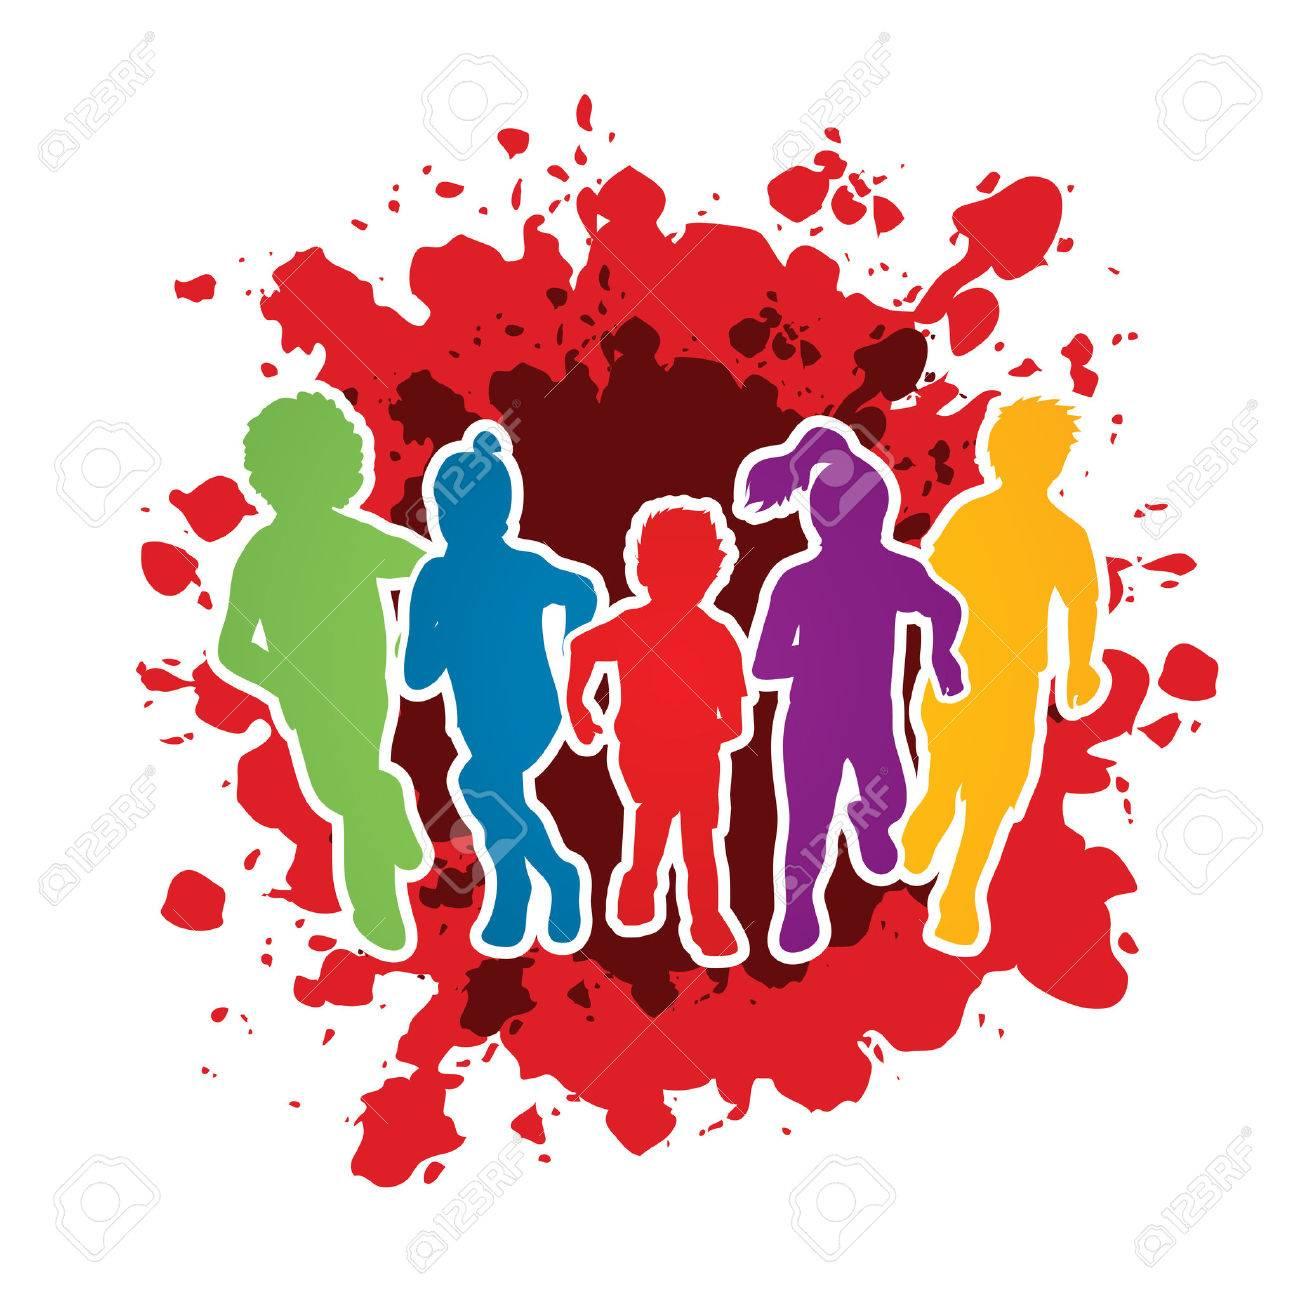 Group of children running , Front view designed on splash ink background graphic vector. - 55997704